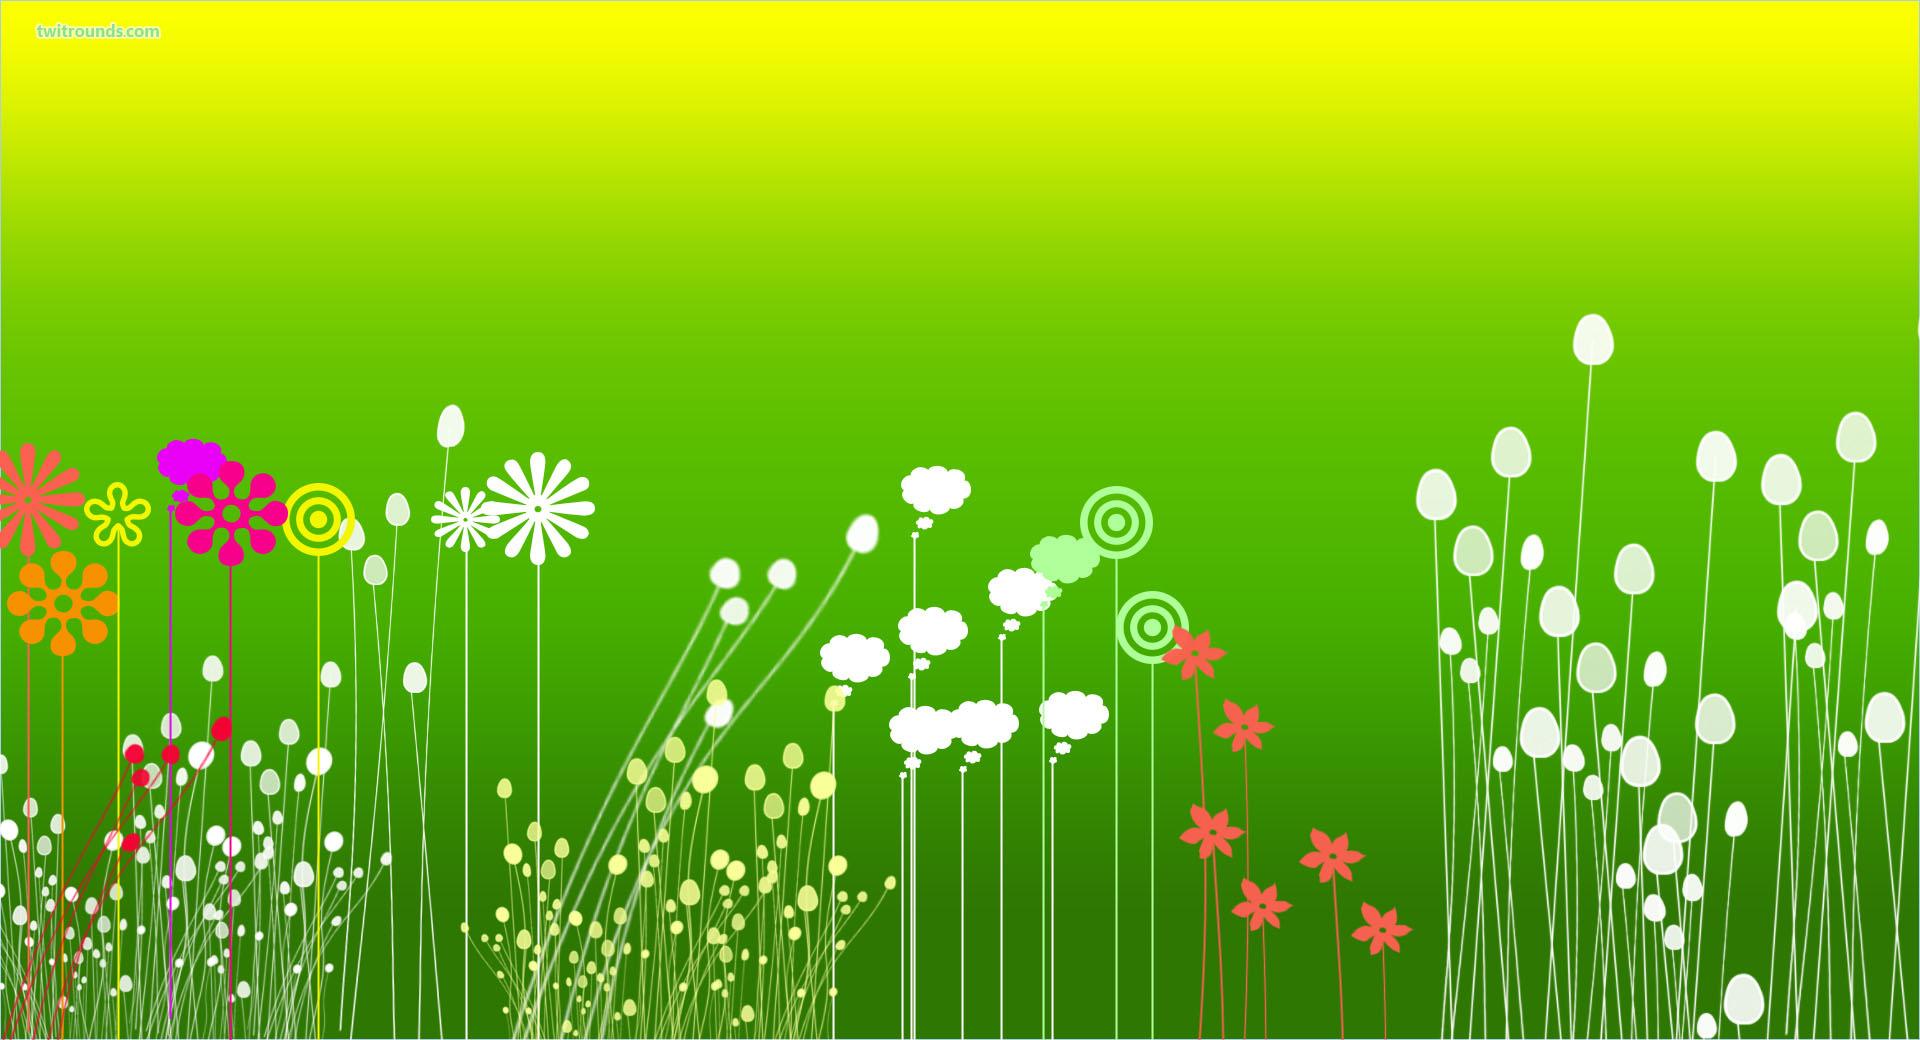 green flower garden backgrounds wallpapers Sprouts Preschool 1920x1040